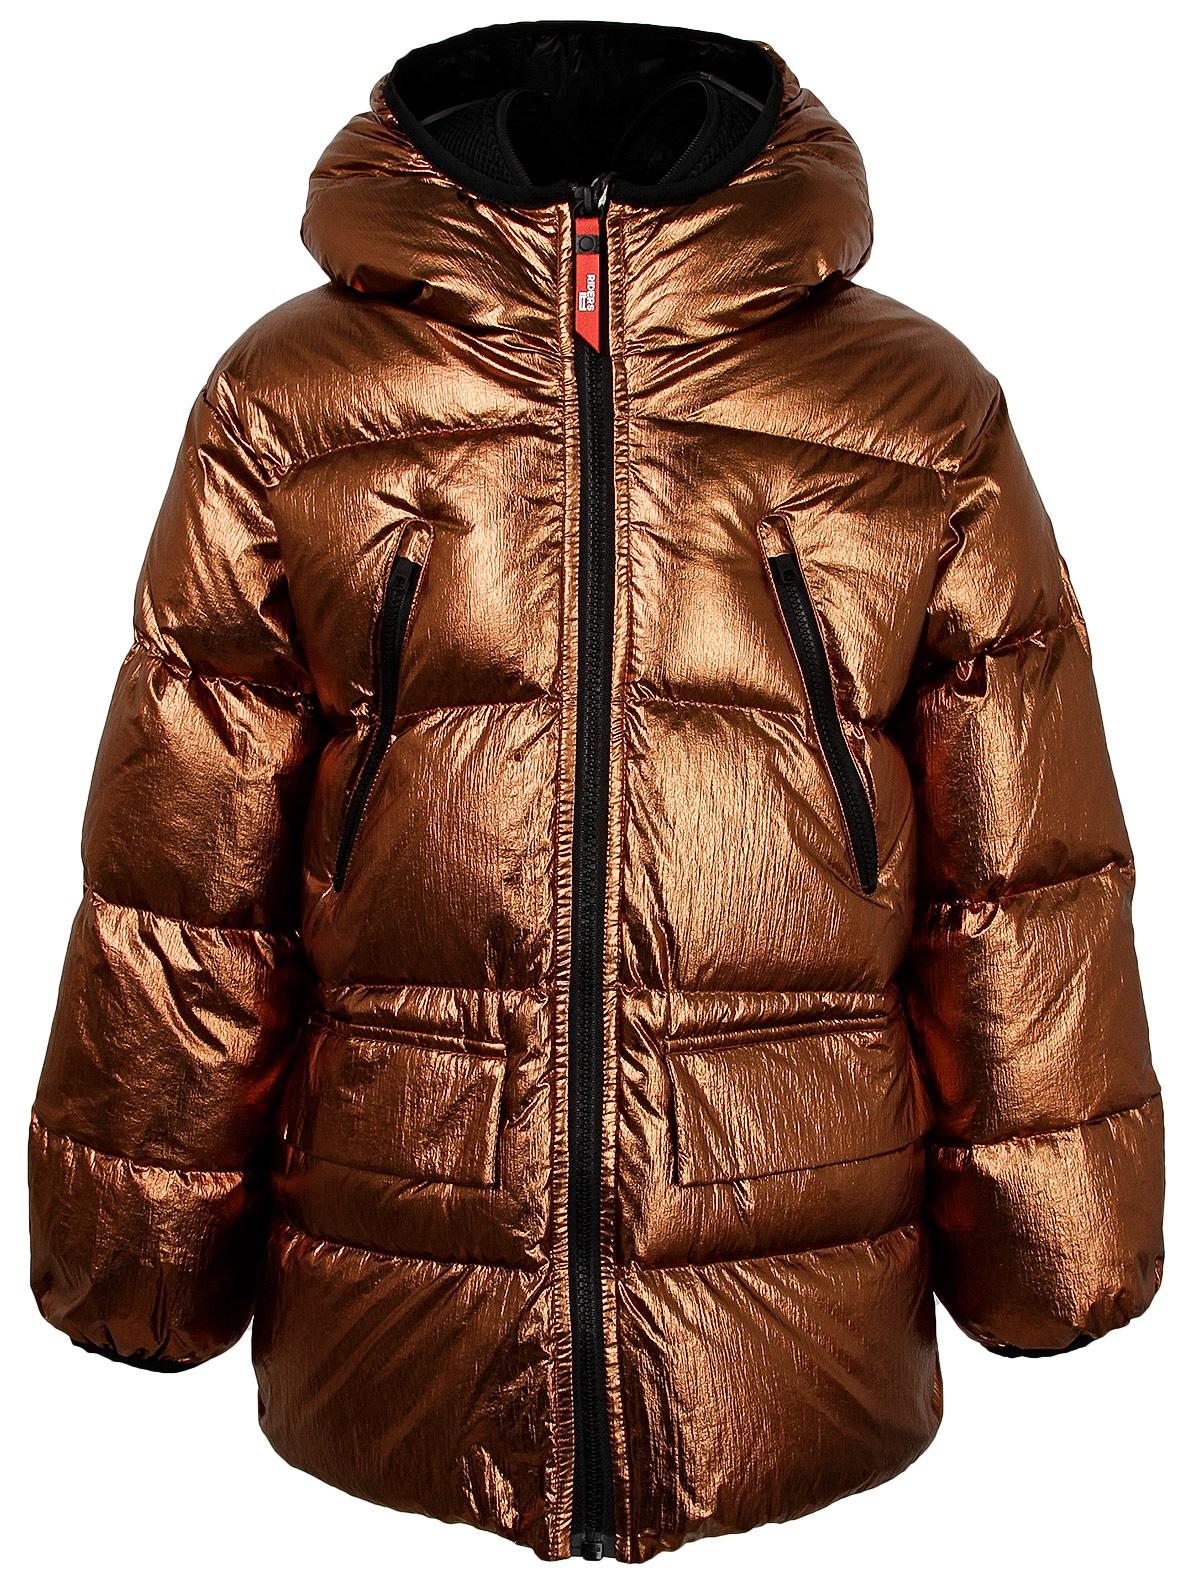 Купить 2251270, Куртка AI Riders on the Storm, коричневый, Женский, 1074509084075